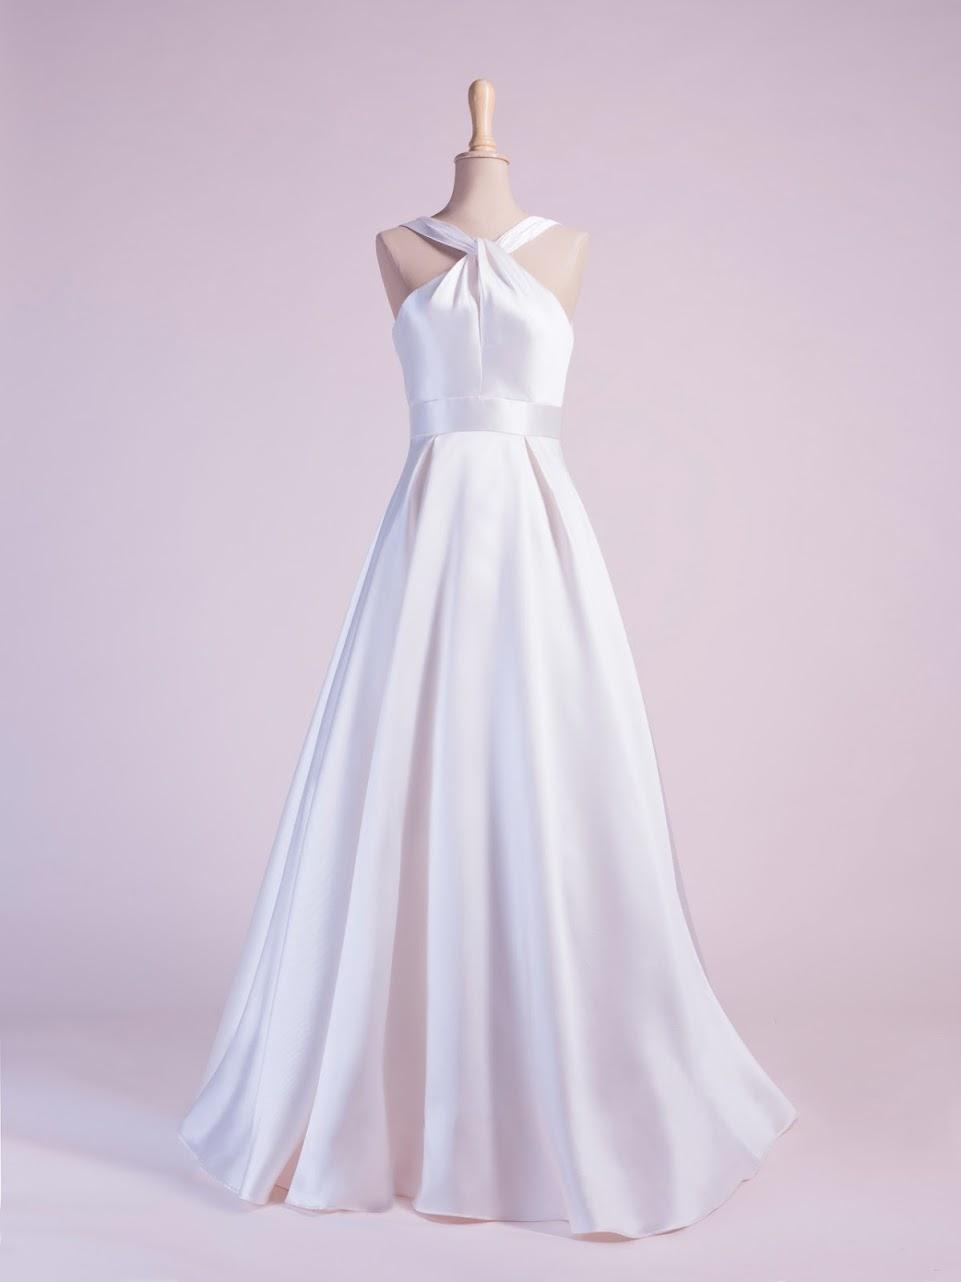 robe-mariage-civil-clara-robe-de-soiree-longue-mikado-en-differentes-couleurs-robe-cocktail-createur